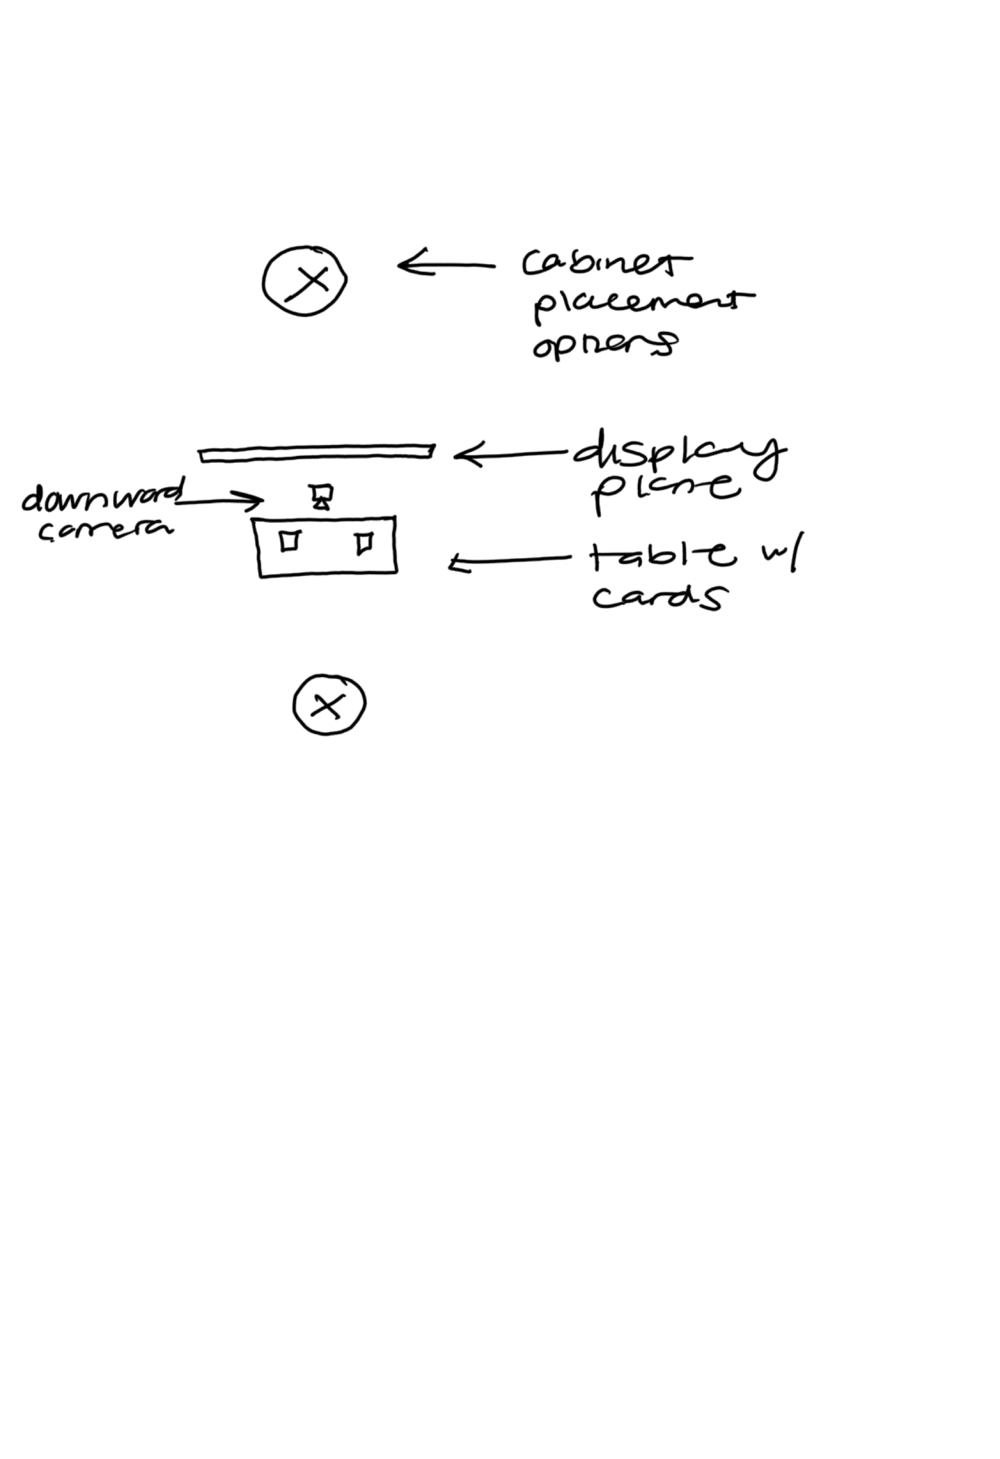 WCM0049.png